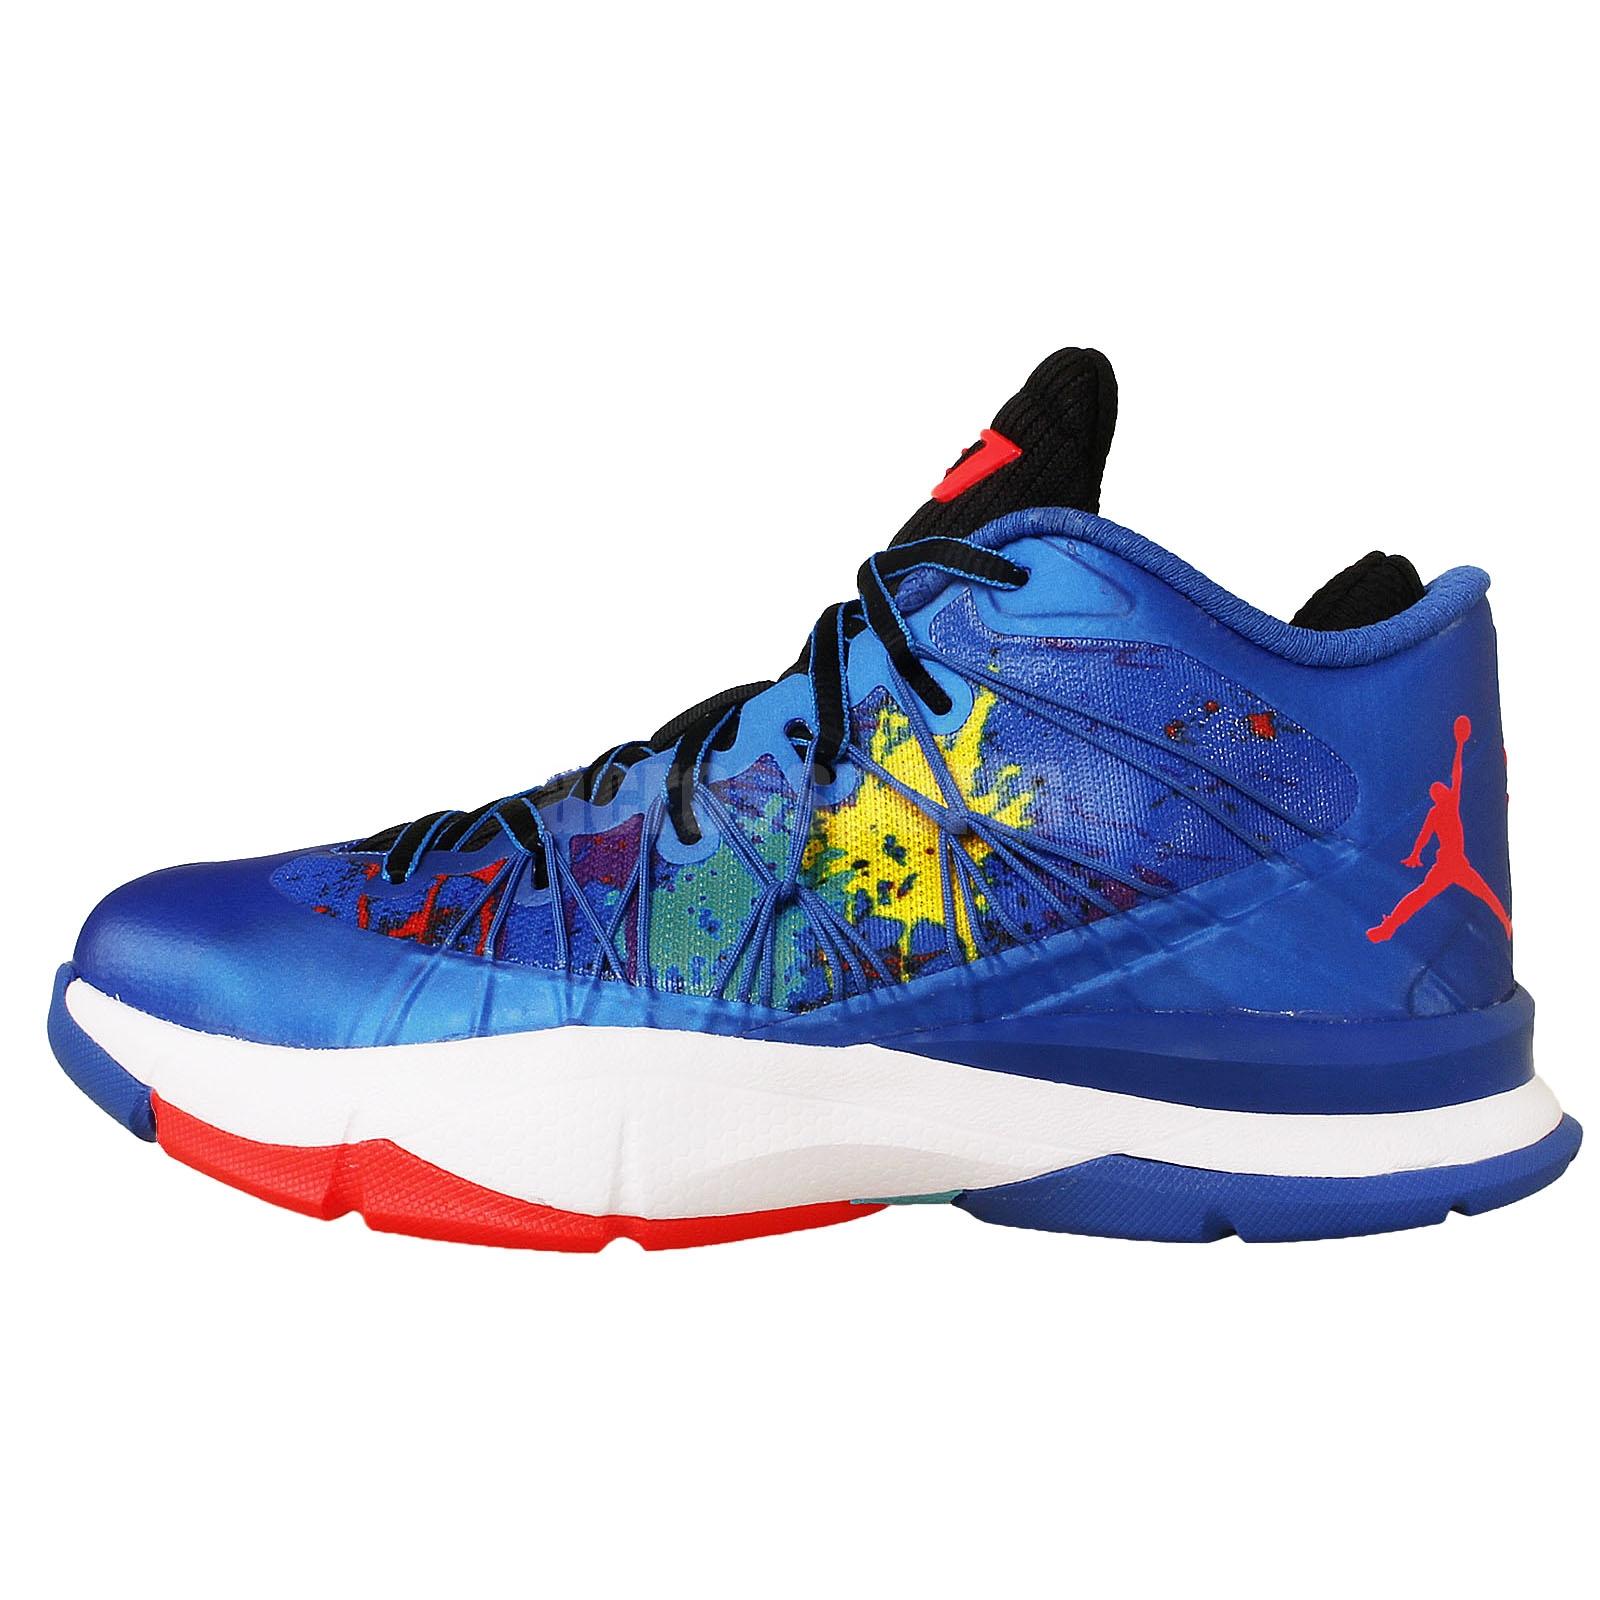 Nike Jordan CP3.VII AE BG GS Blue 2014 Chris Paul Youth ...